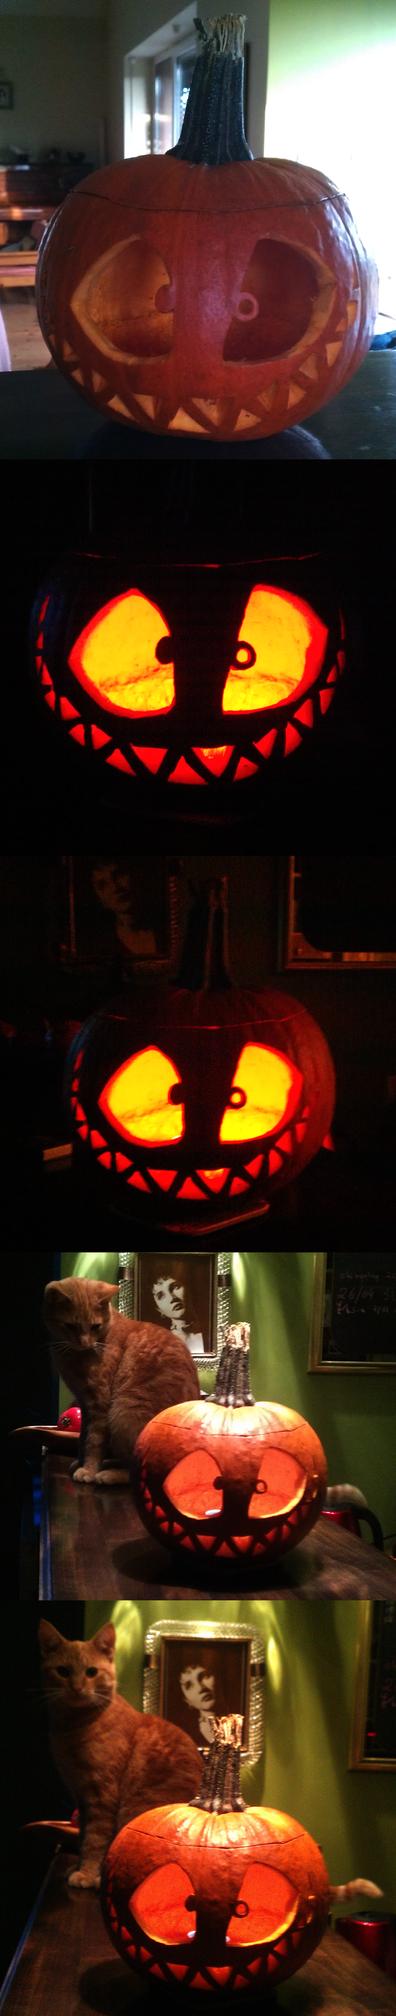 pumpkin_head_by_emily13s-d6slrfs.png